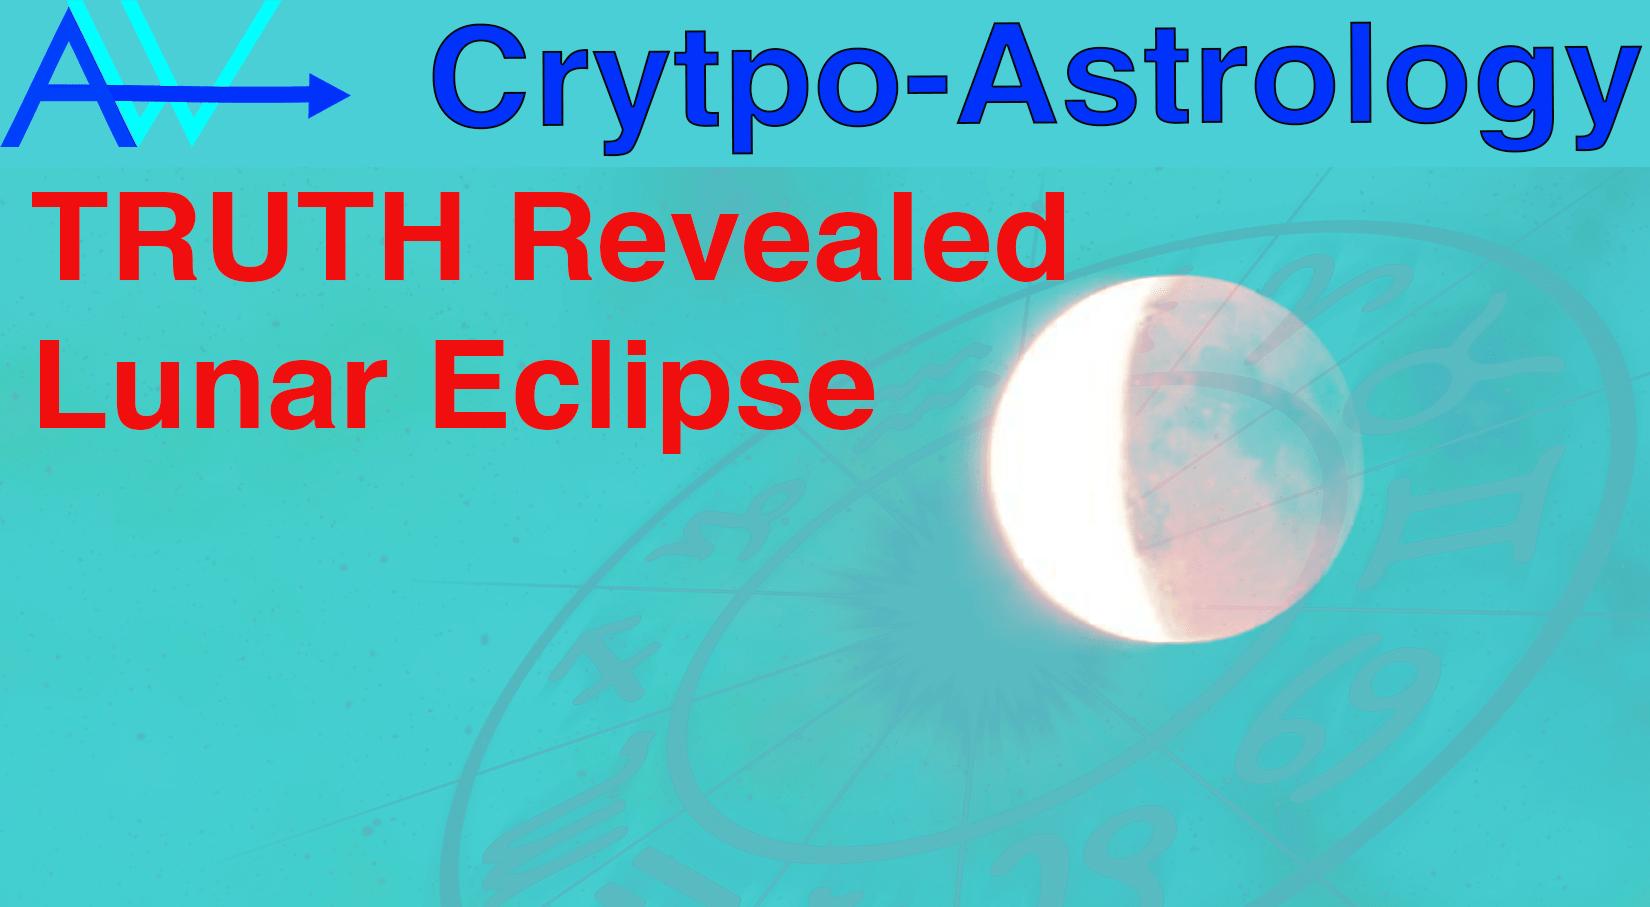 Lunar Eclipse – SECRETS UNVEILED – CryptoAstrology<br><span style='color:#00adee;font-size:.8em'>Secrets Unveiled Lunar Eclipse </span>